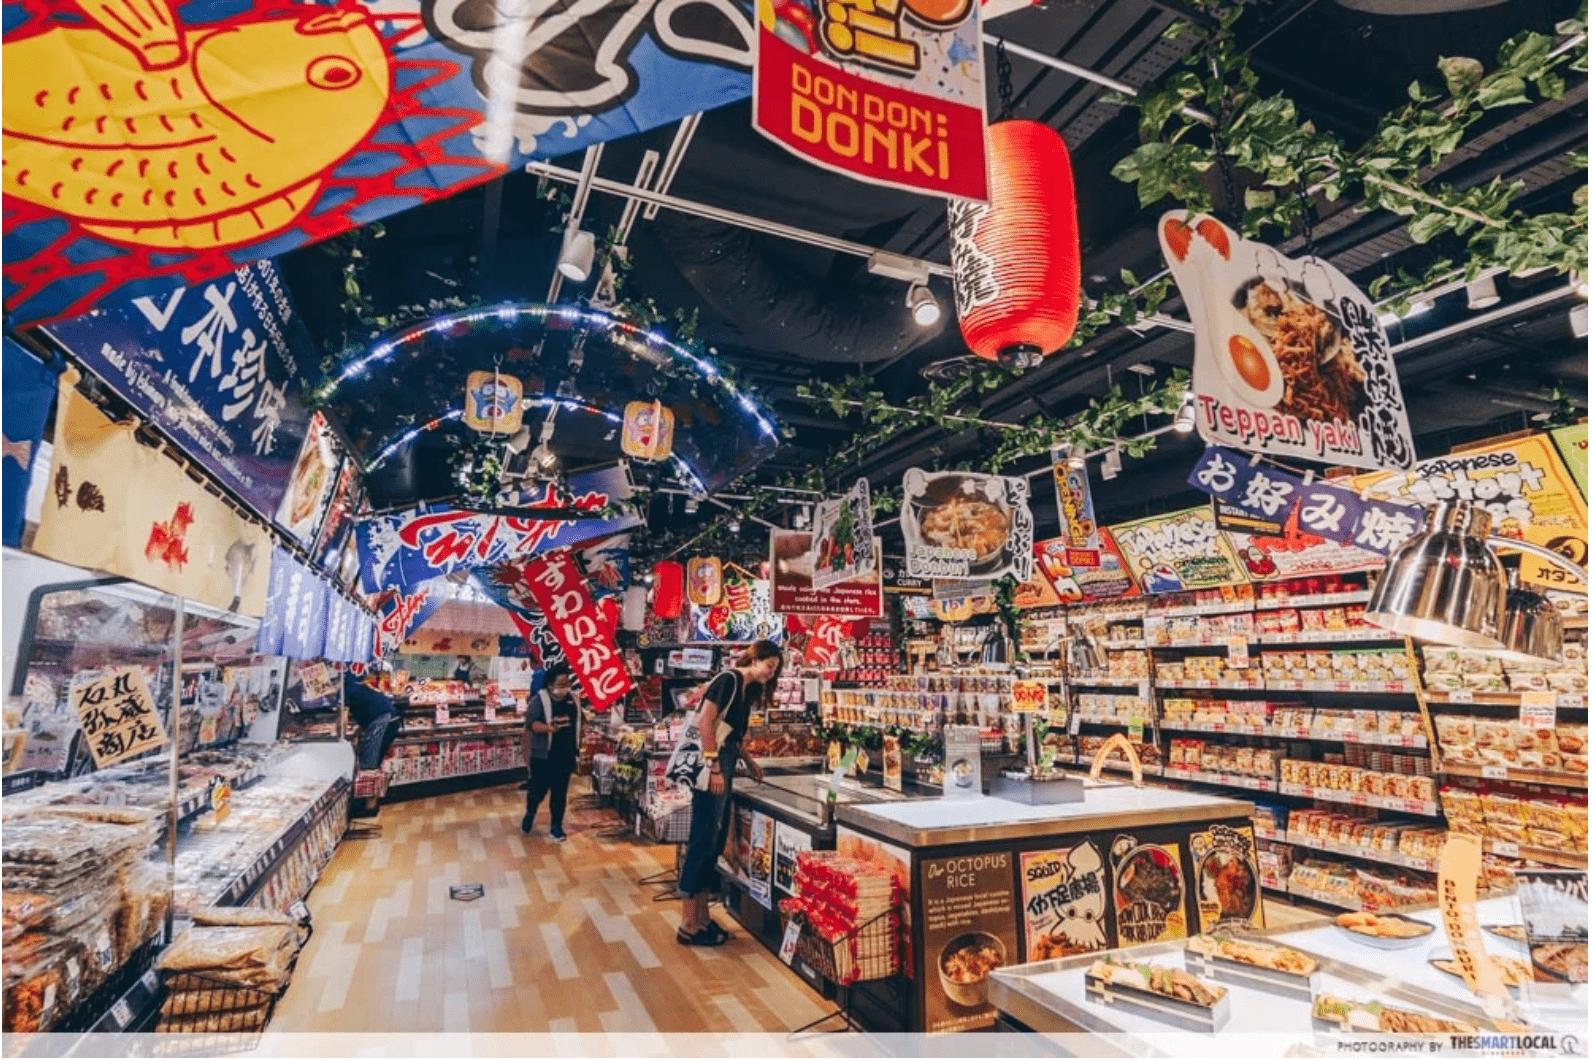 Japanese Supermarket: Don Don Donki